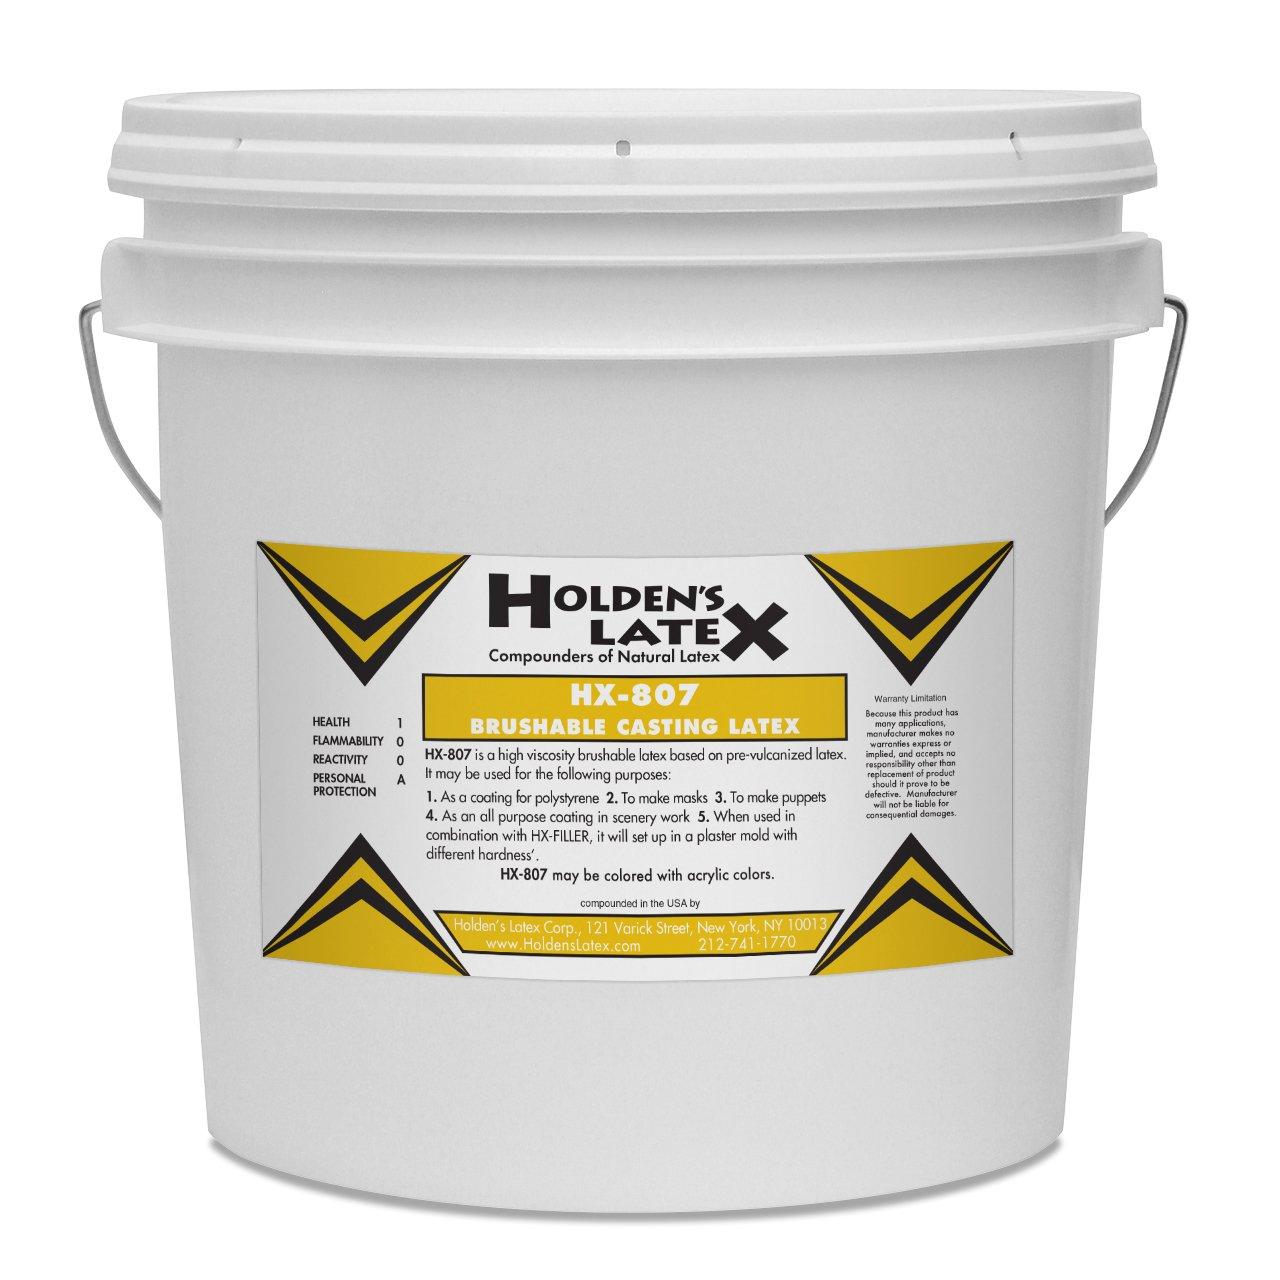 HX-807 Brushable Mask Making & Casting Latex (2 Gallon Bucket)